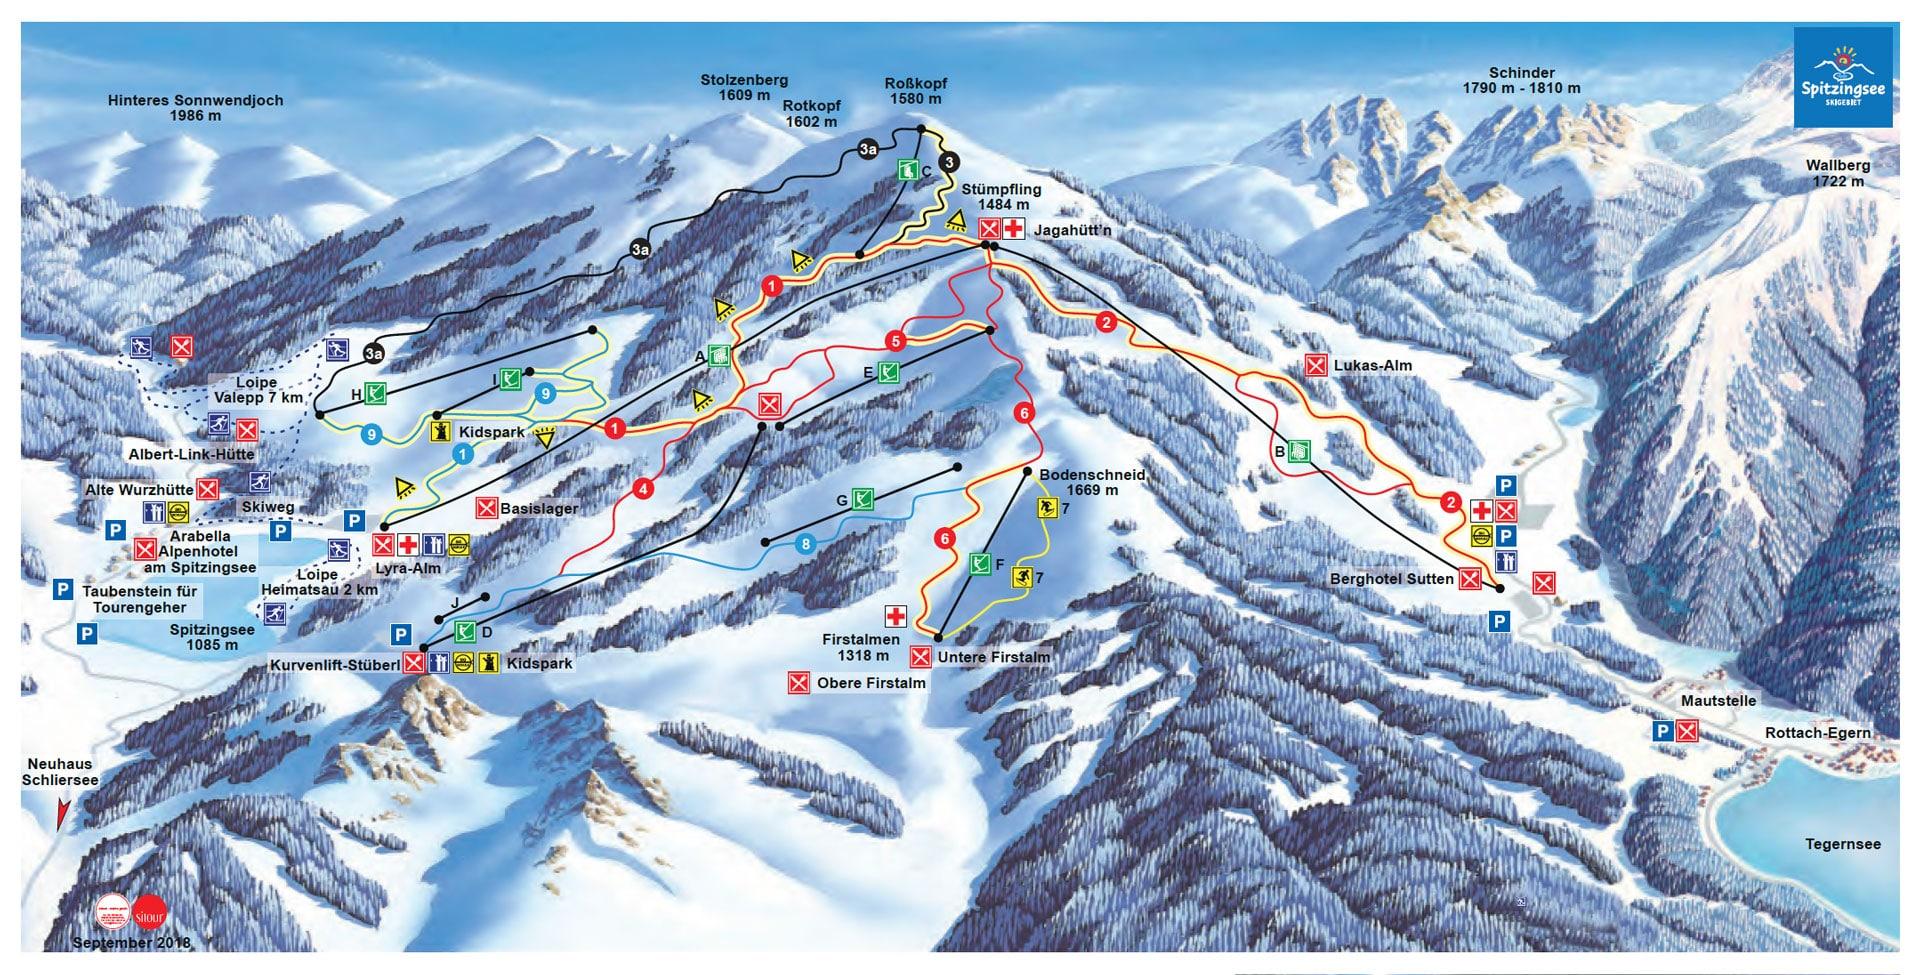 Pistenplan 2019-20 Skigebiet Spitzingsee-Tegernsee